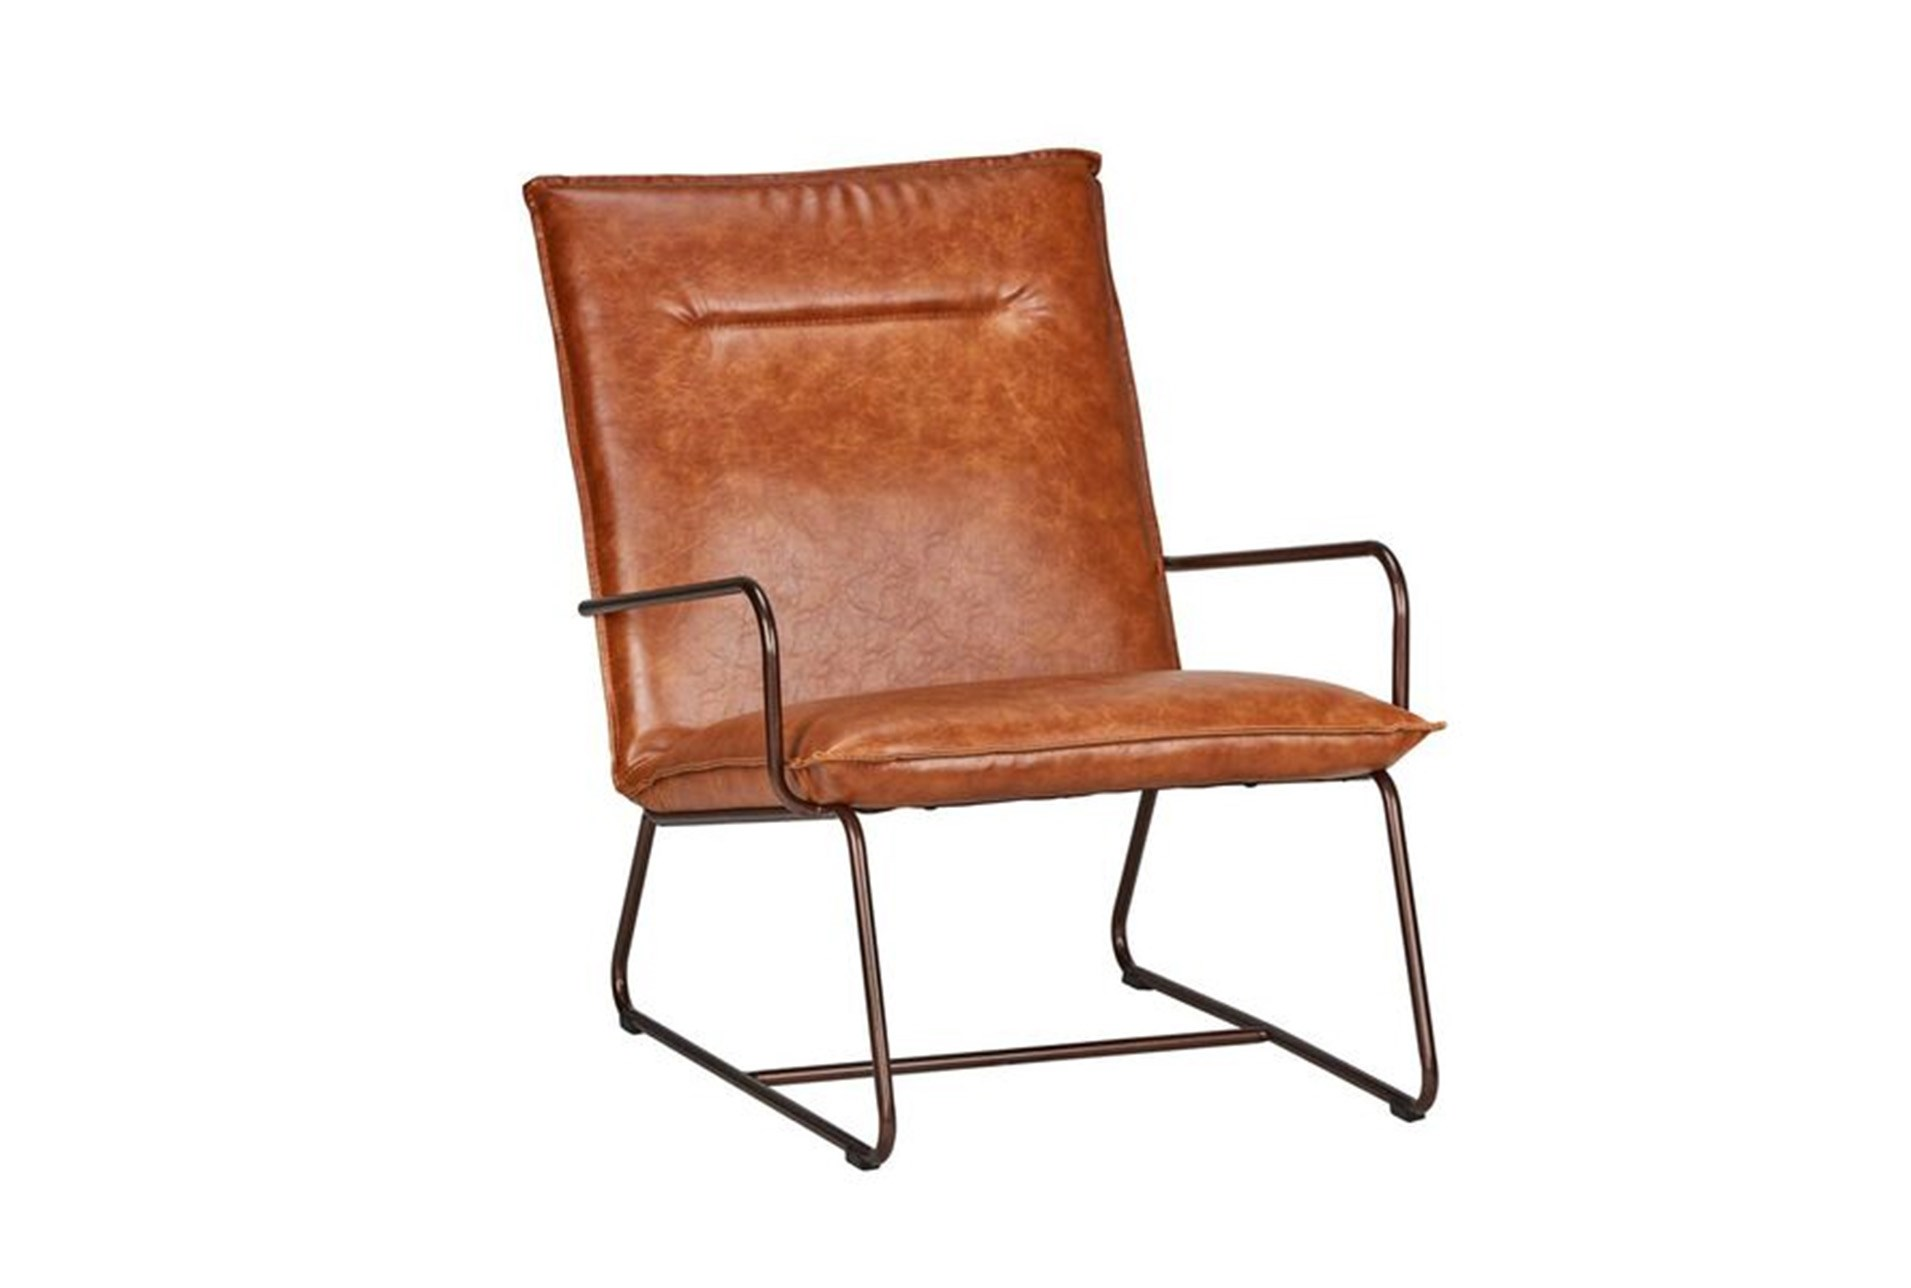 Marvelous Cognac Leather Lounge Chair Creativecarmelina Interior Chair Design Creativecarmelinacom